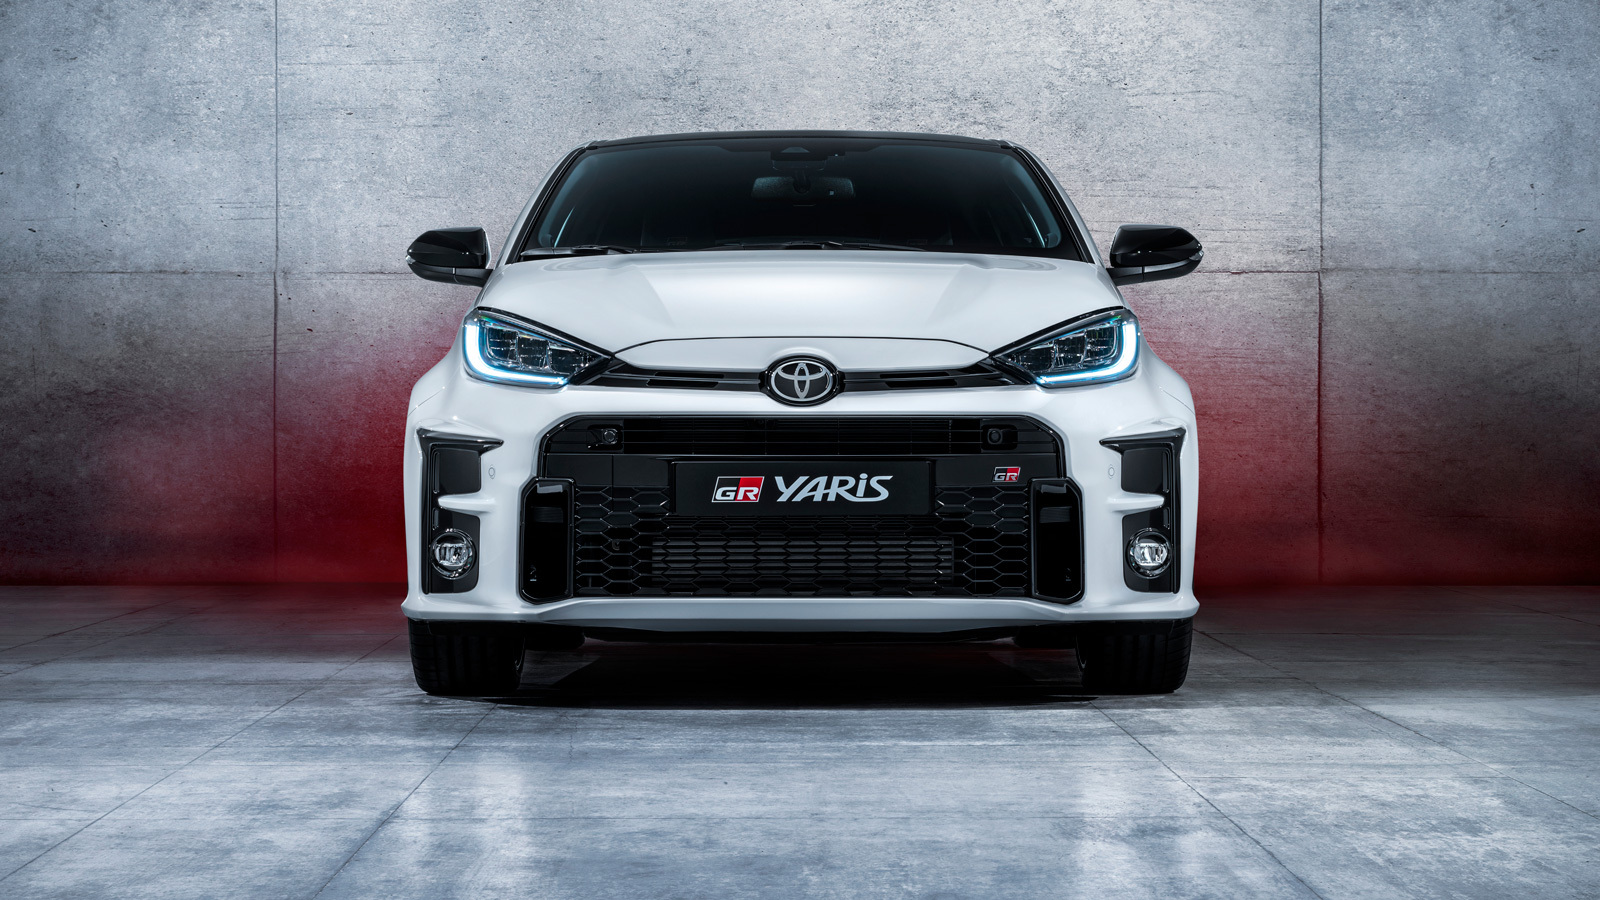 GR Yaris Rallye Edition - pre-order at Sunshine Toyota!